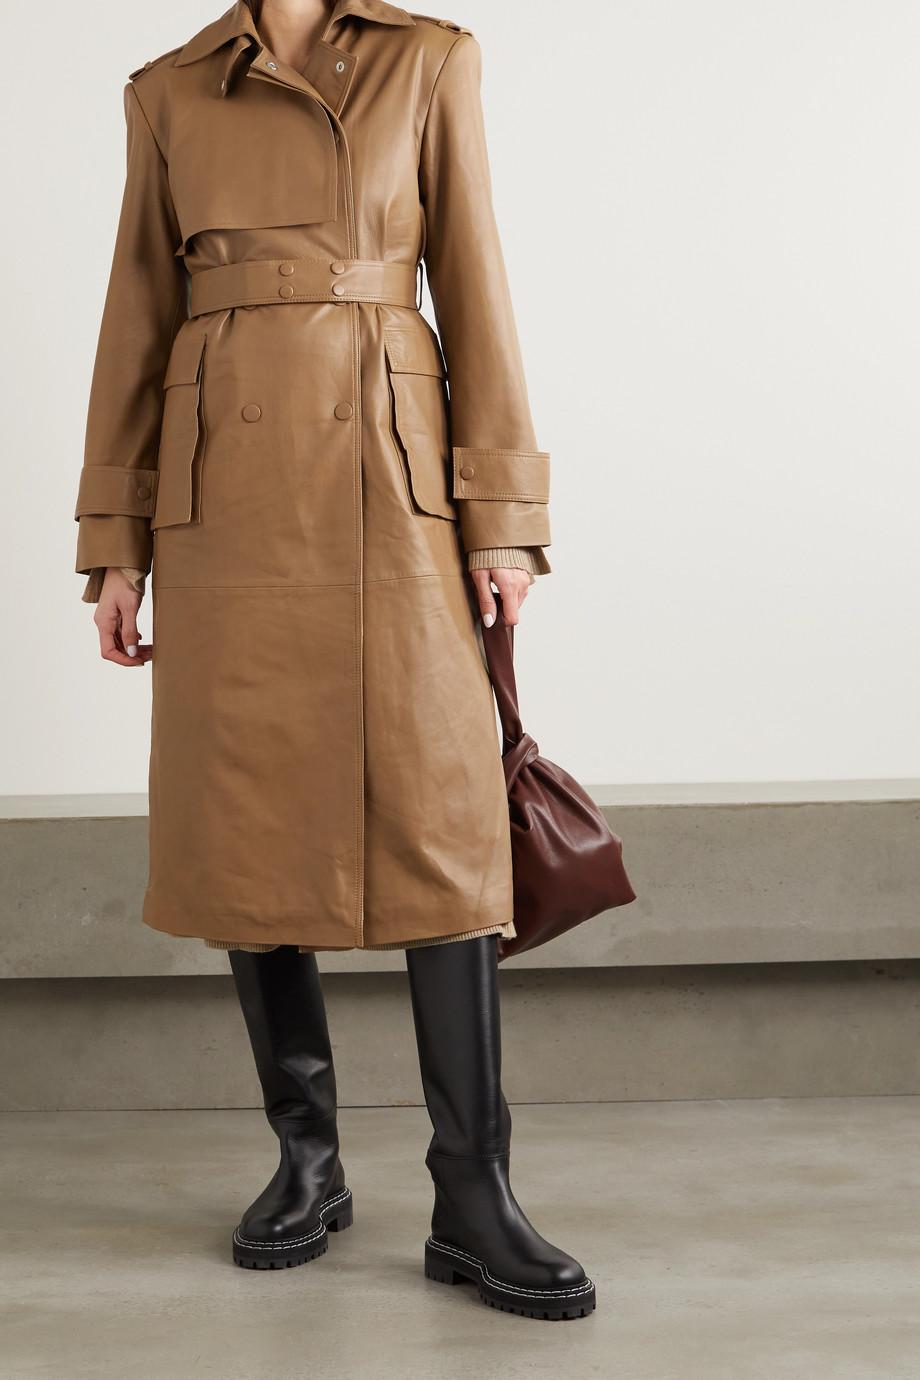 REMAIN Birger Christensen Pirello belted leather trench coat